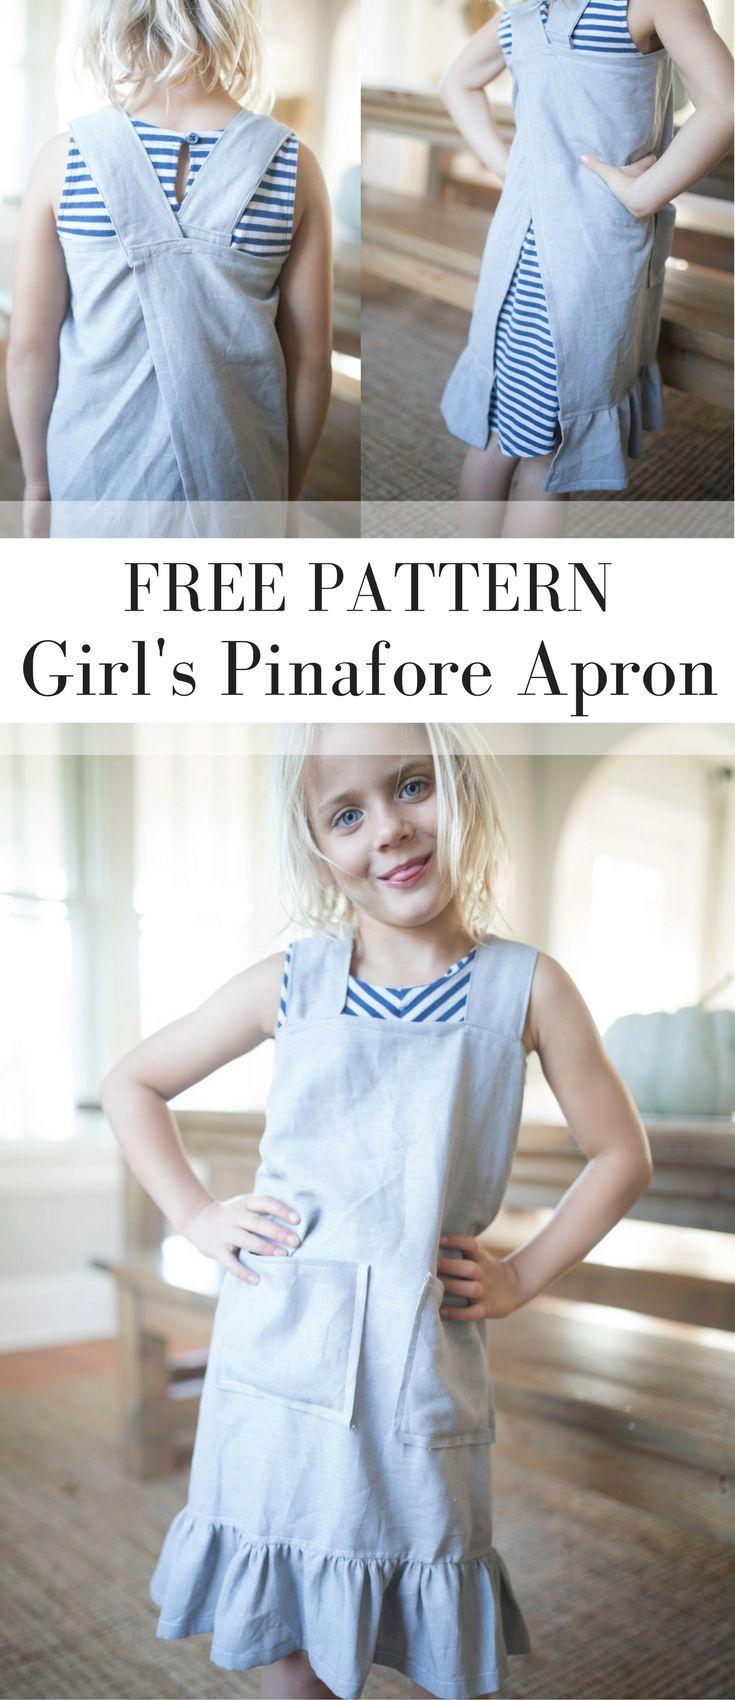 DIY Pinafore Apron for Girls Free Pattern | Crafts | Pinterest ...